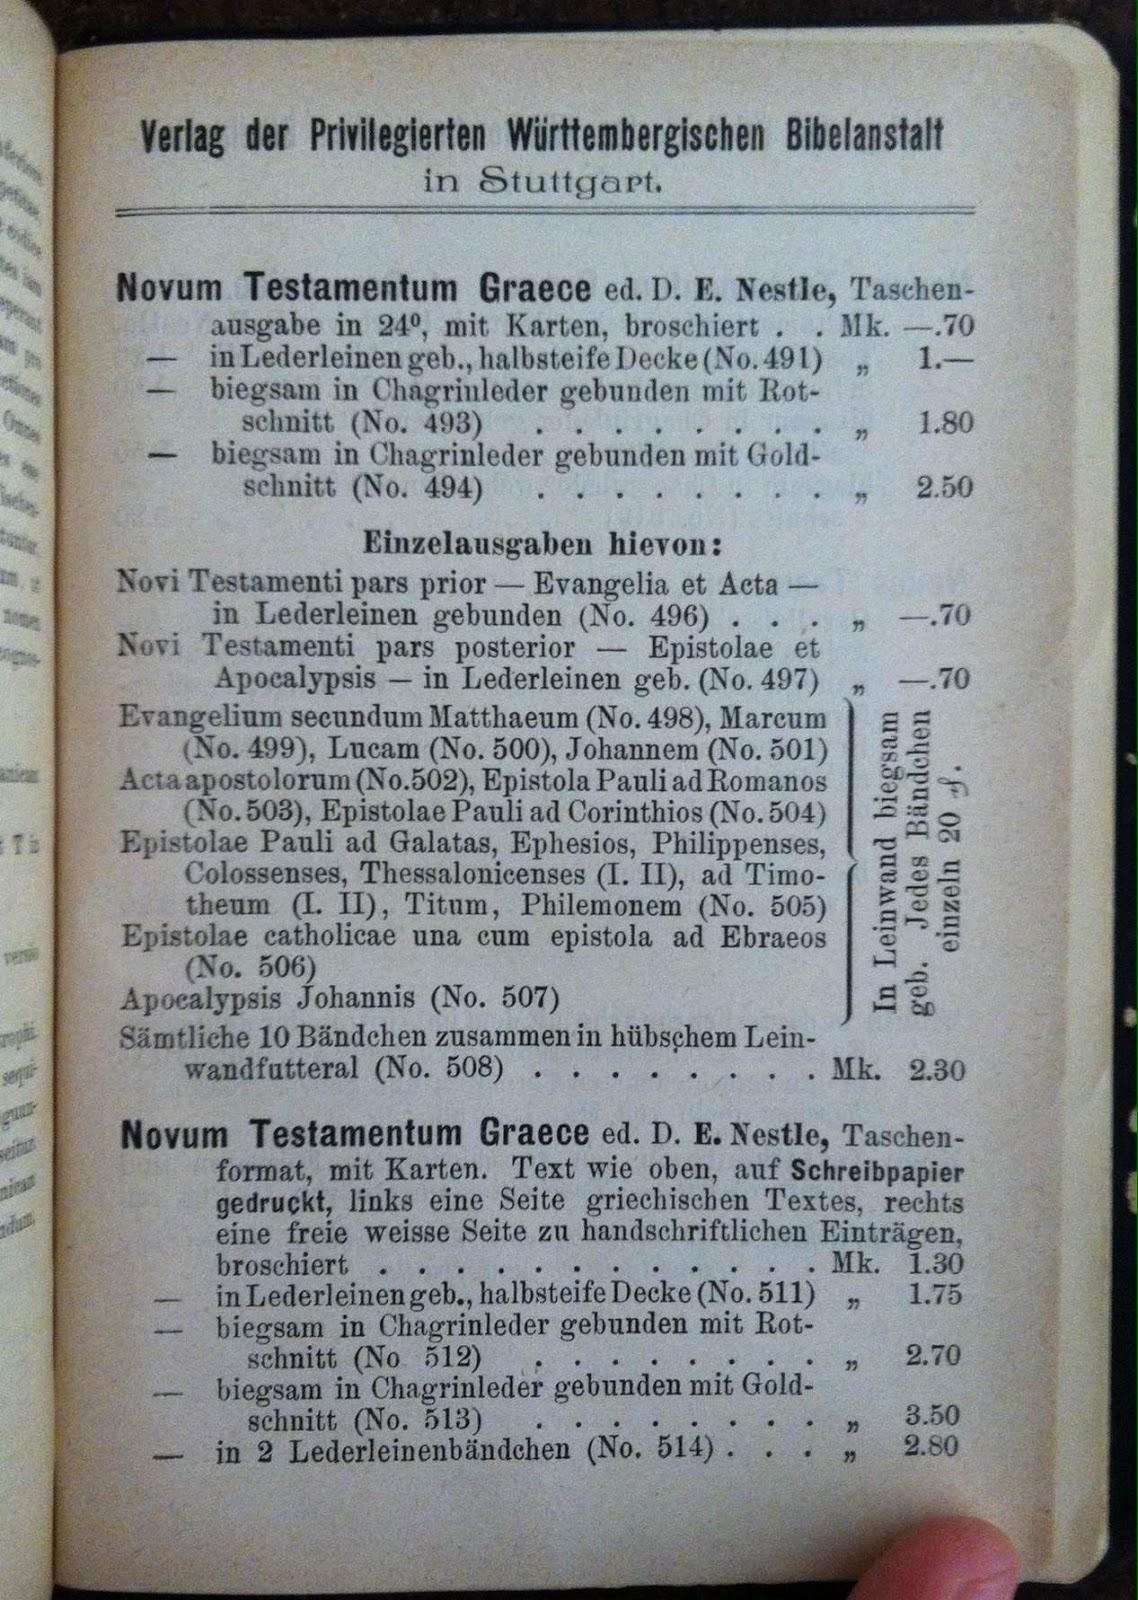 Novum testamentum graece et latine online dating